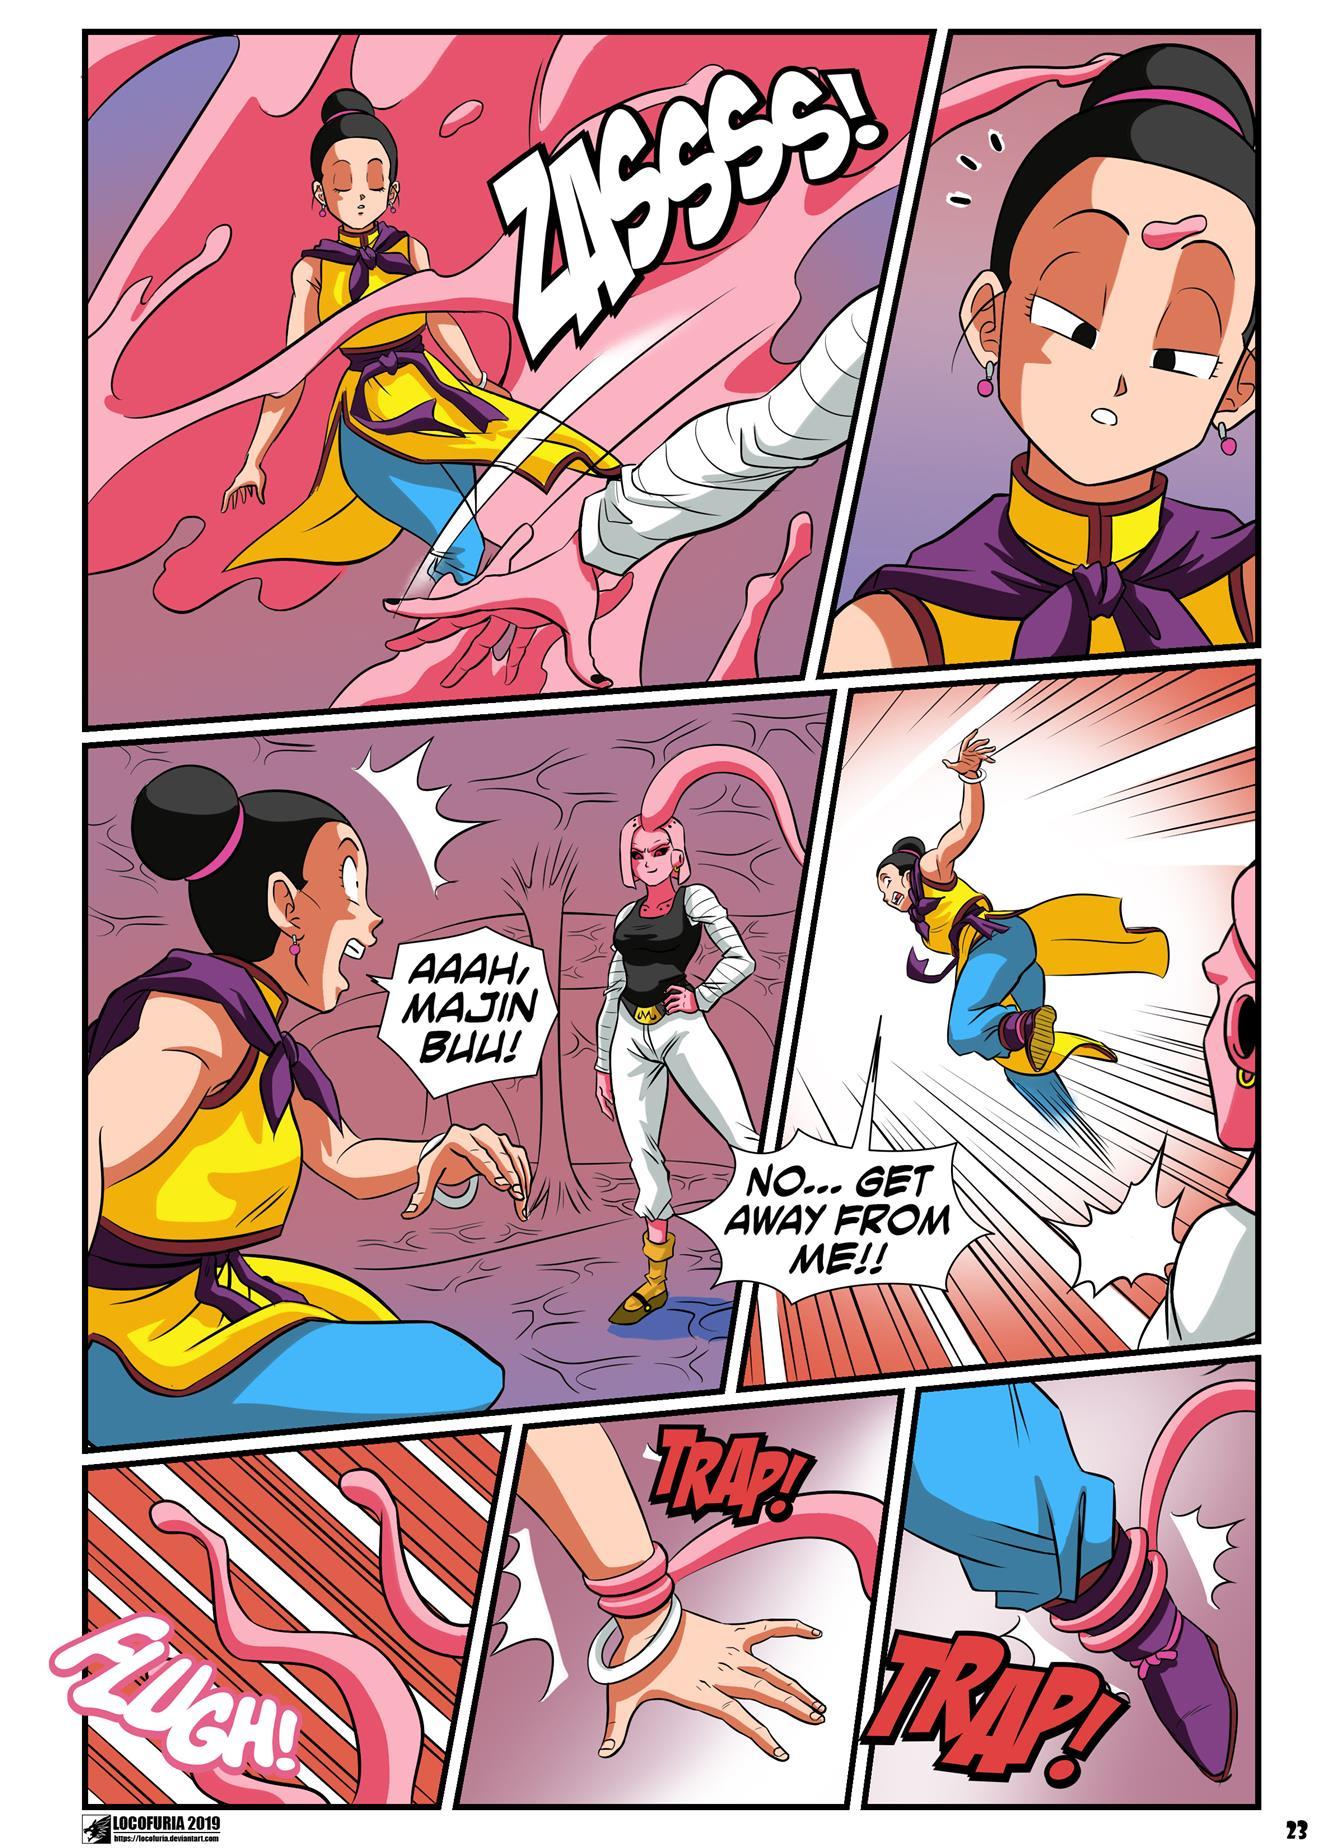 Buu's Bodies 4 (Dragon Ball Z) - Foto 25